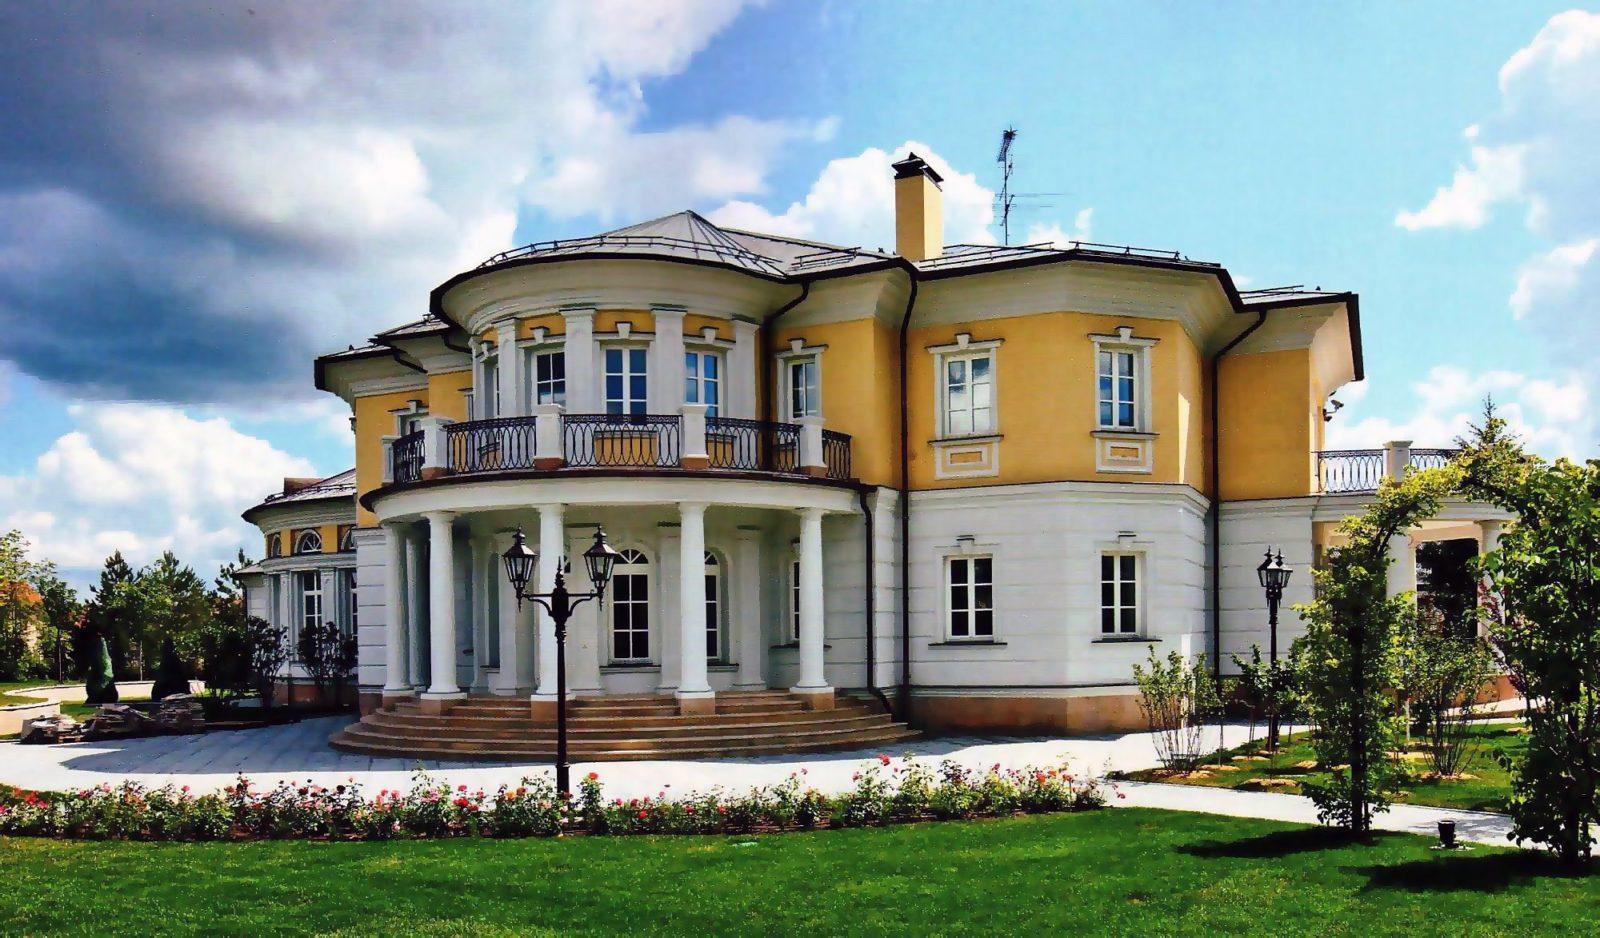 Ампир стиль в архитектуре